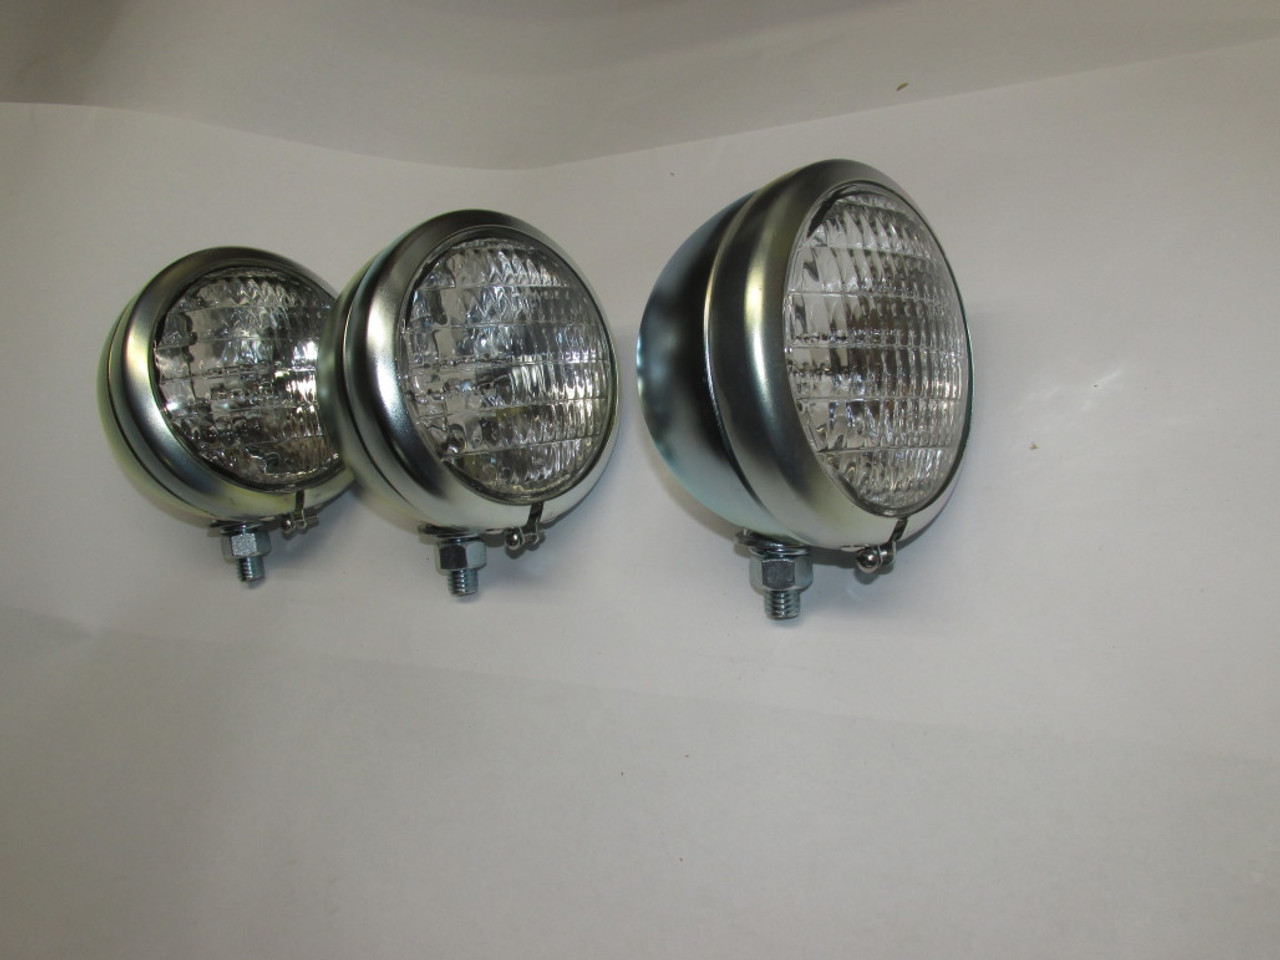 "Set of 3 - 4 1/2"" Head Lights 12V"